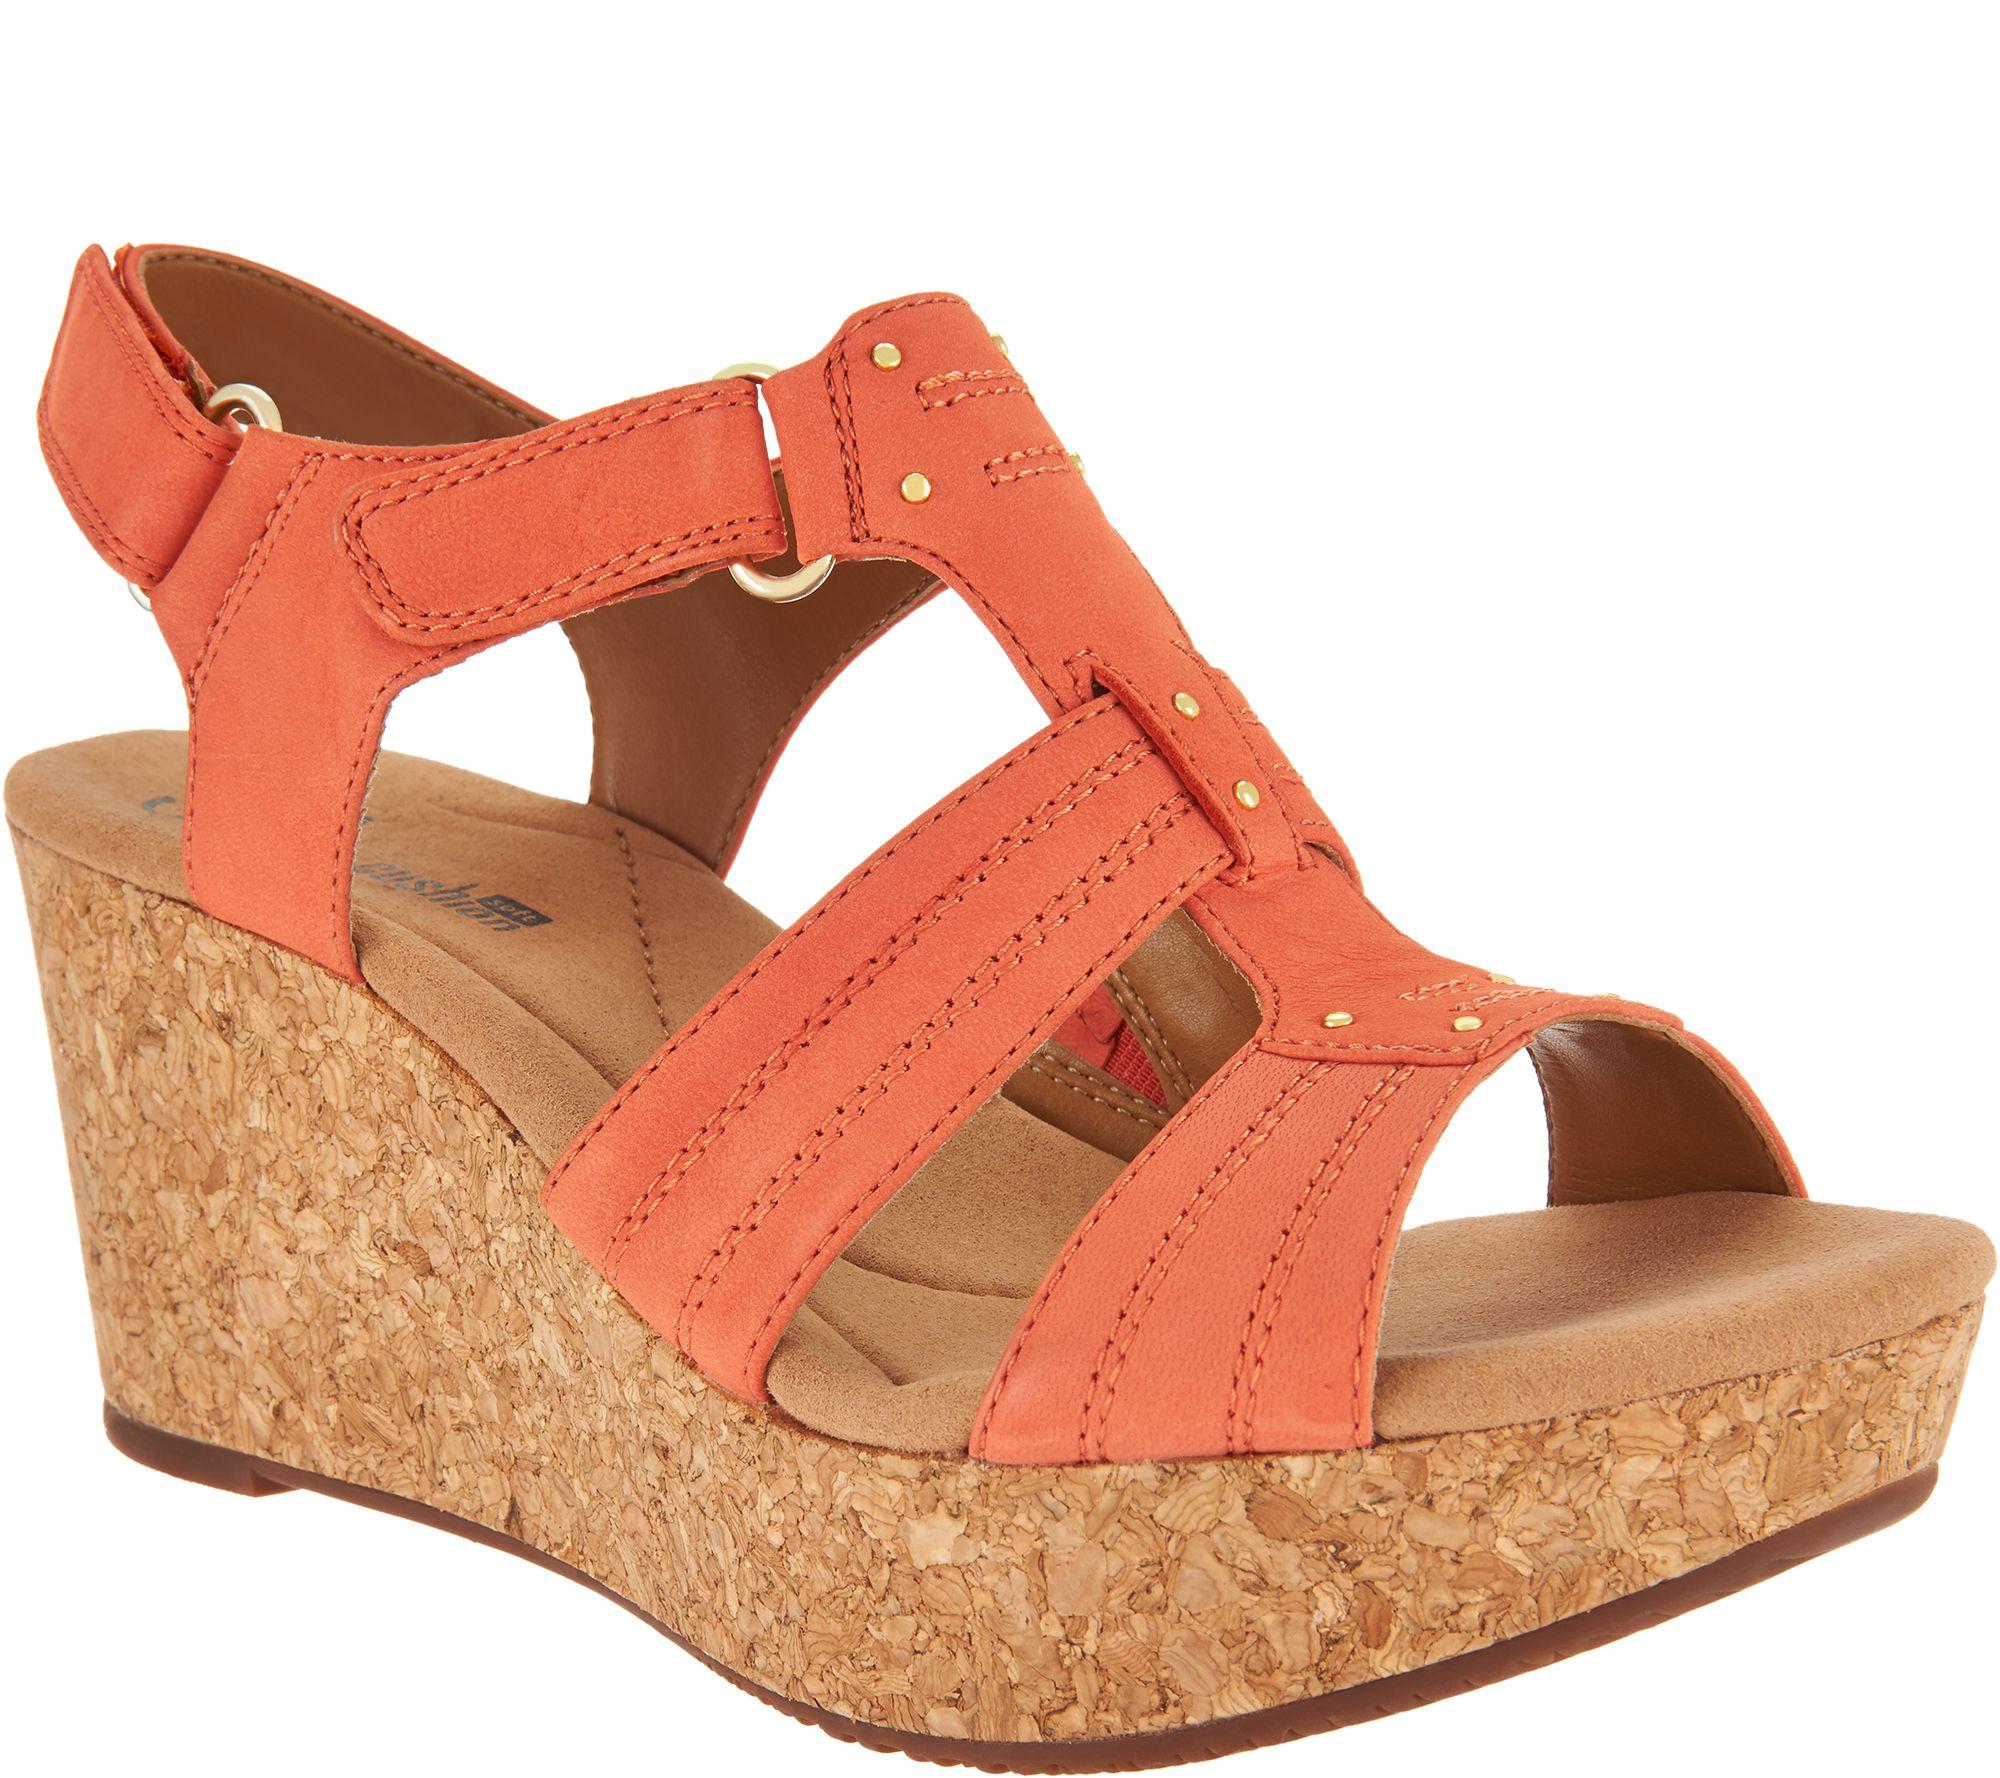 7e35284d4a13 Clarks Leather Triple Adjust Wedge Sandals - Annadel Orchid - Page 1 —  QVC.com